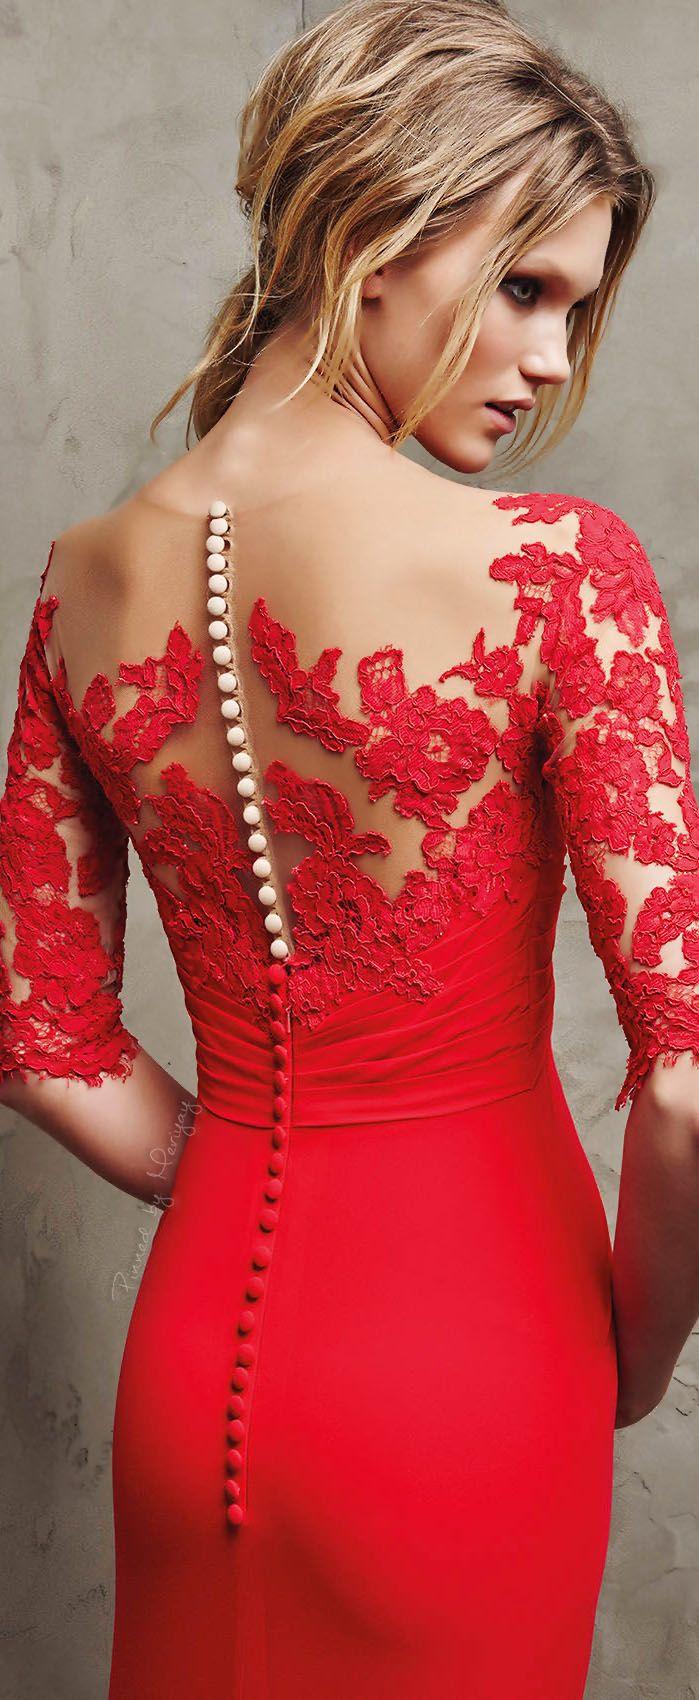 best royal and decent dresses images on pinterest classy dress